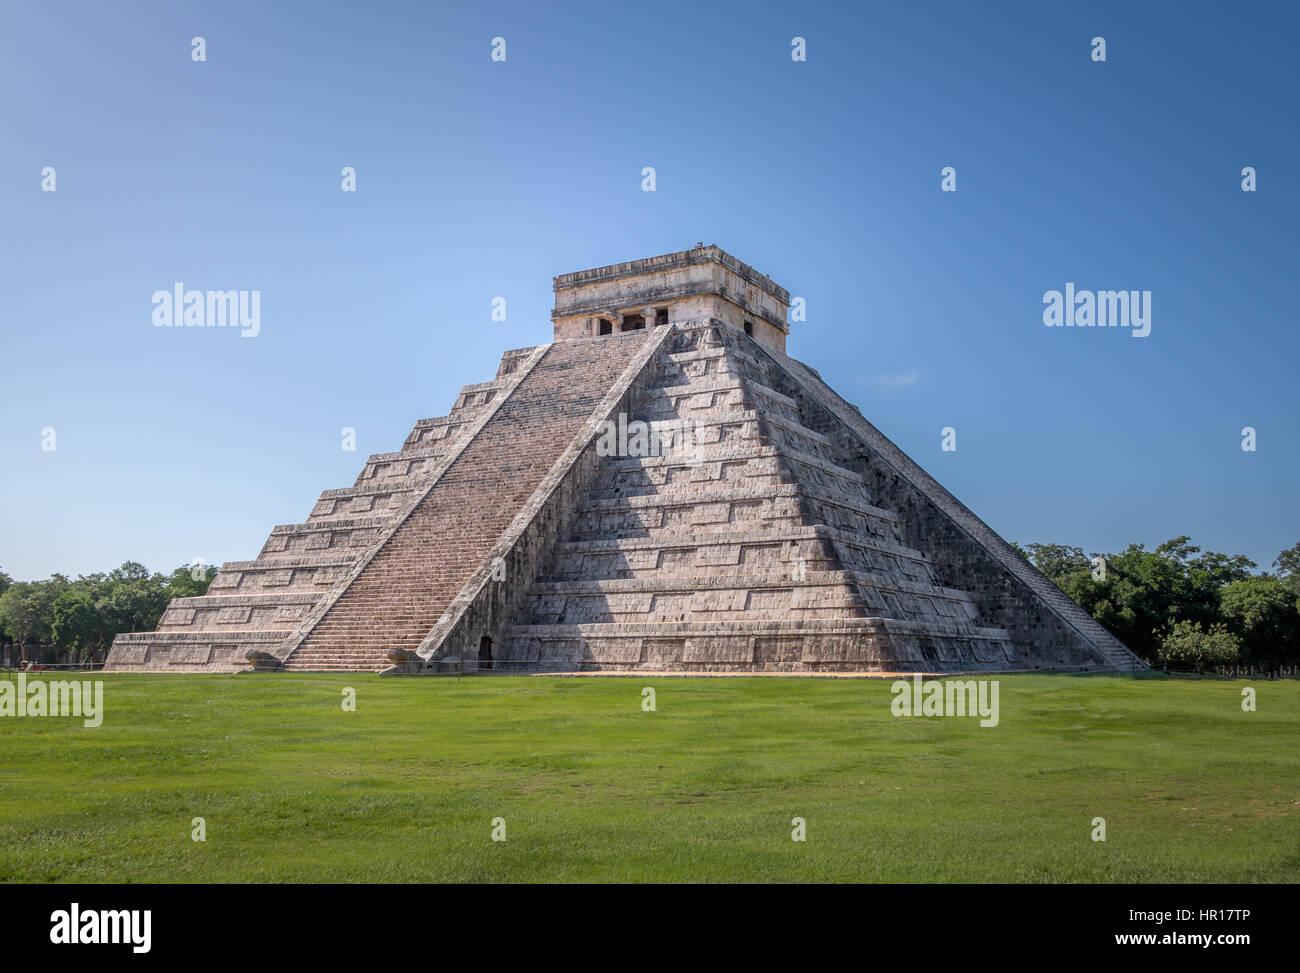 Templo Maya pirámide de Kukulkán, Chichén Itzá, Yucatán, México Imagen De Stock